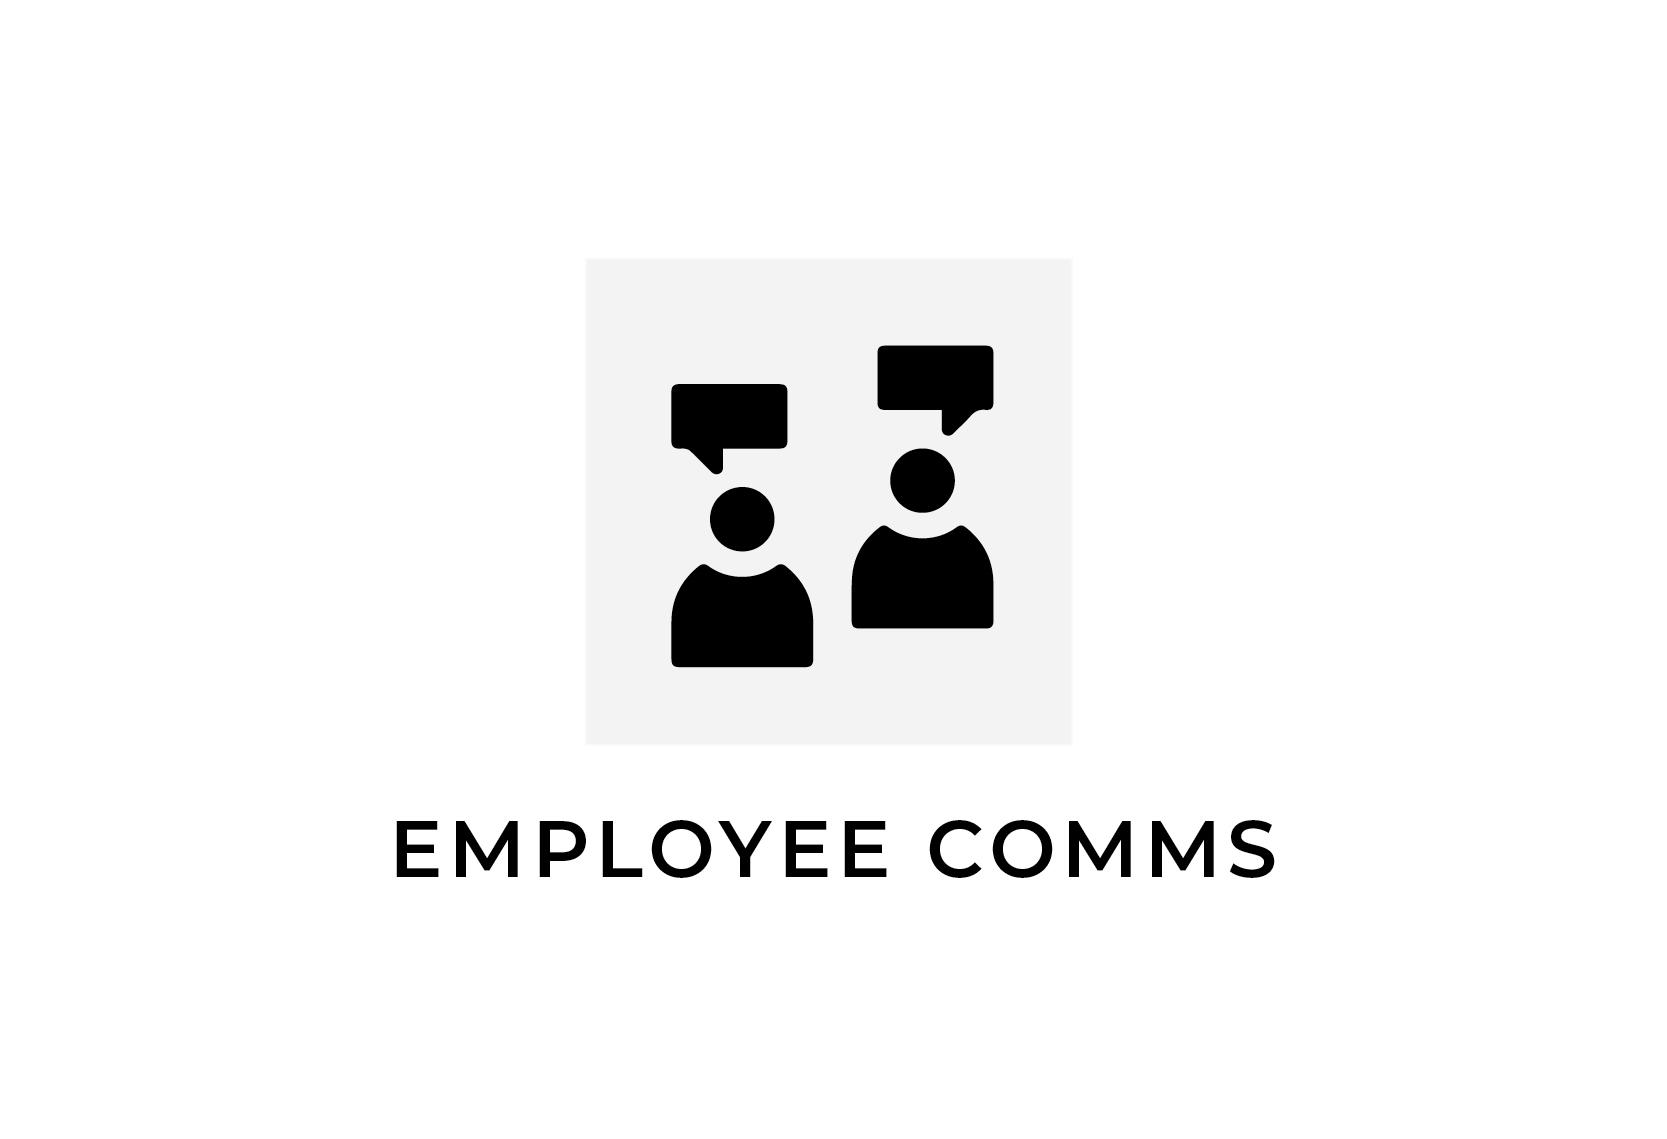 EmployeeComms.jpg